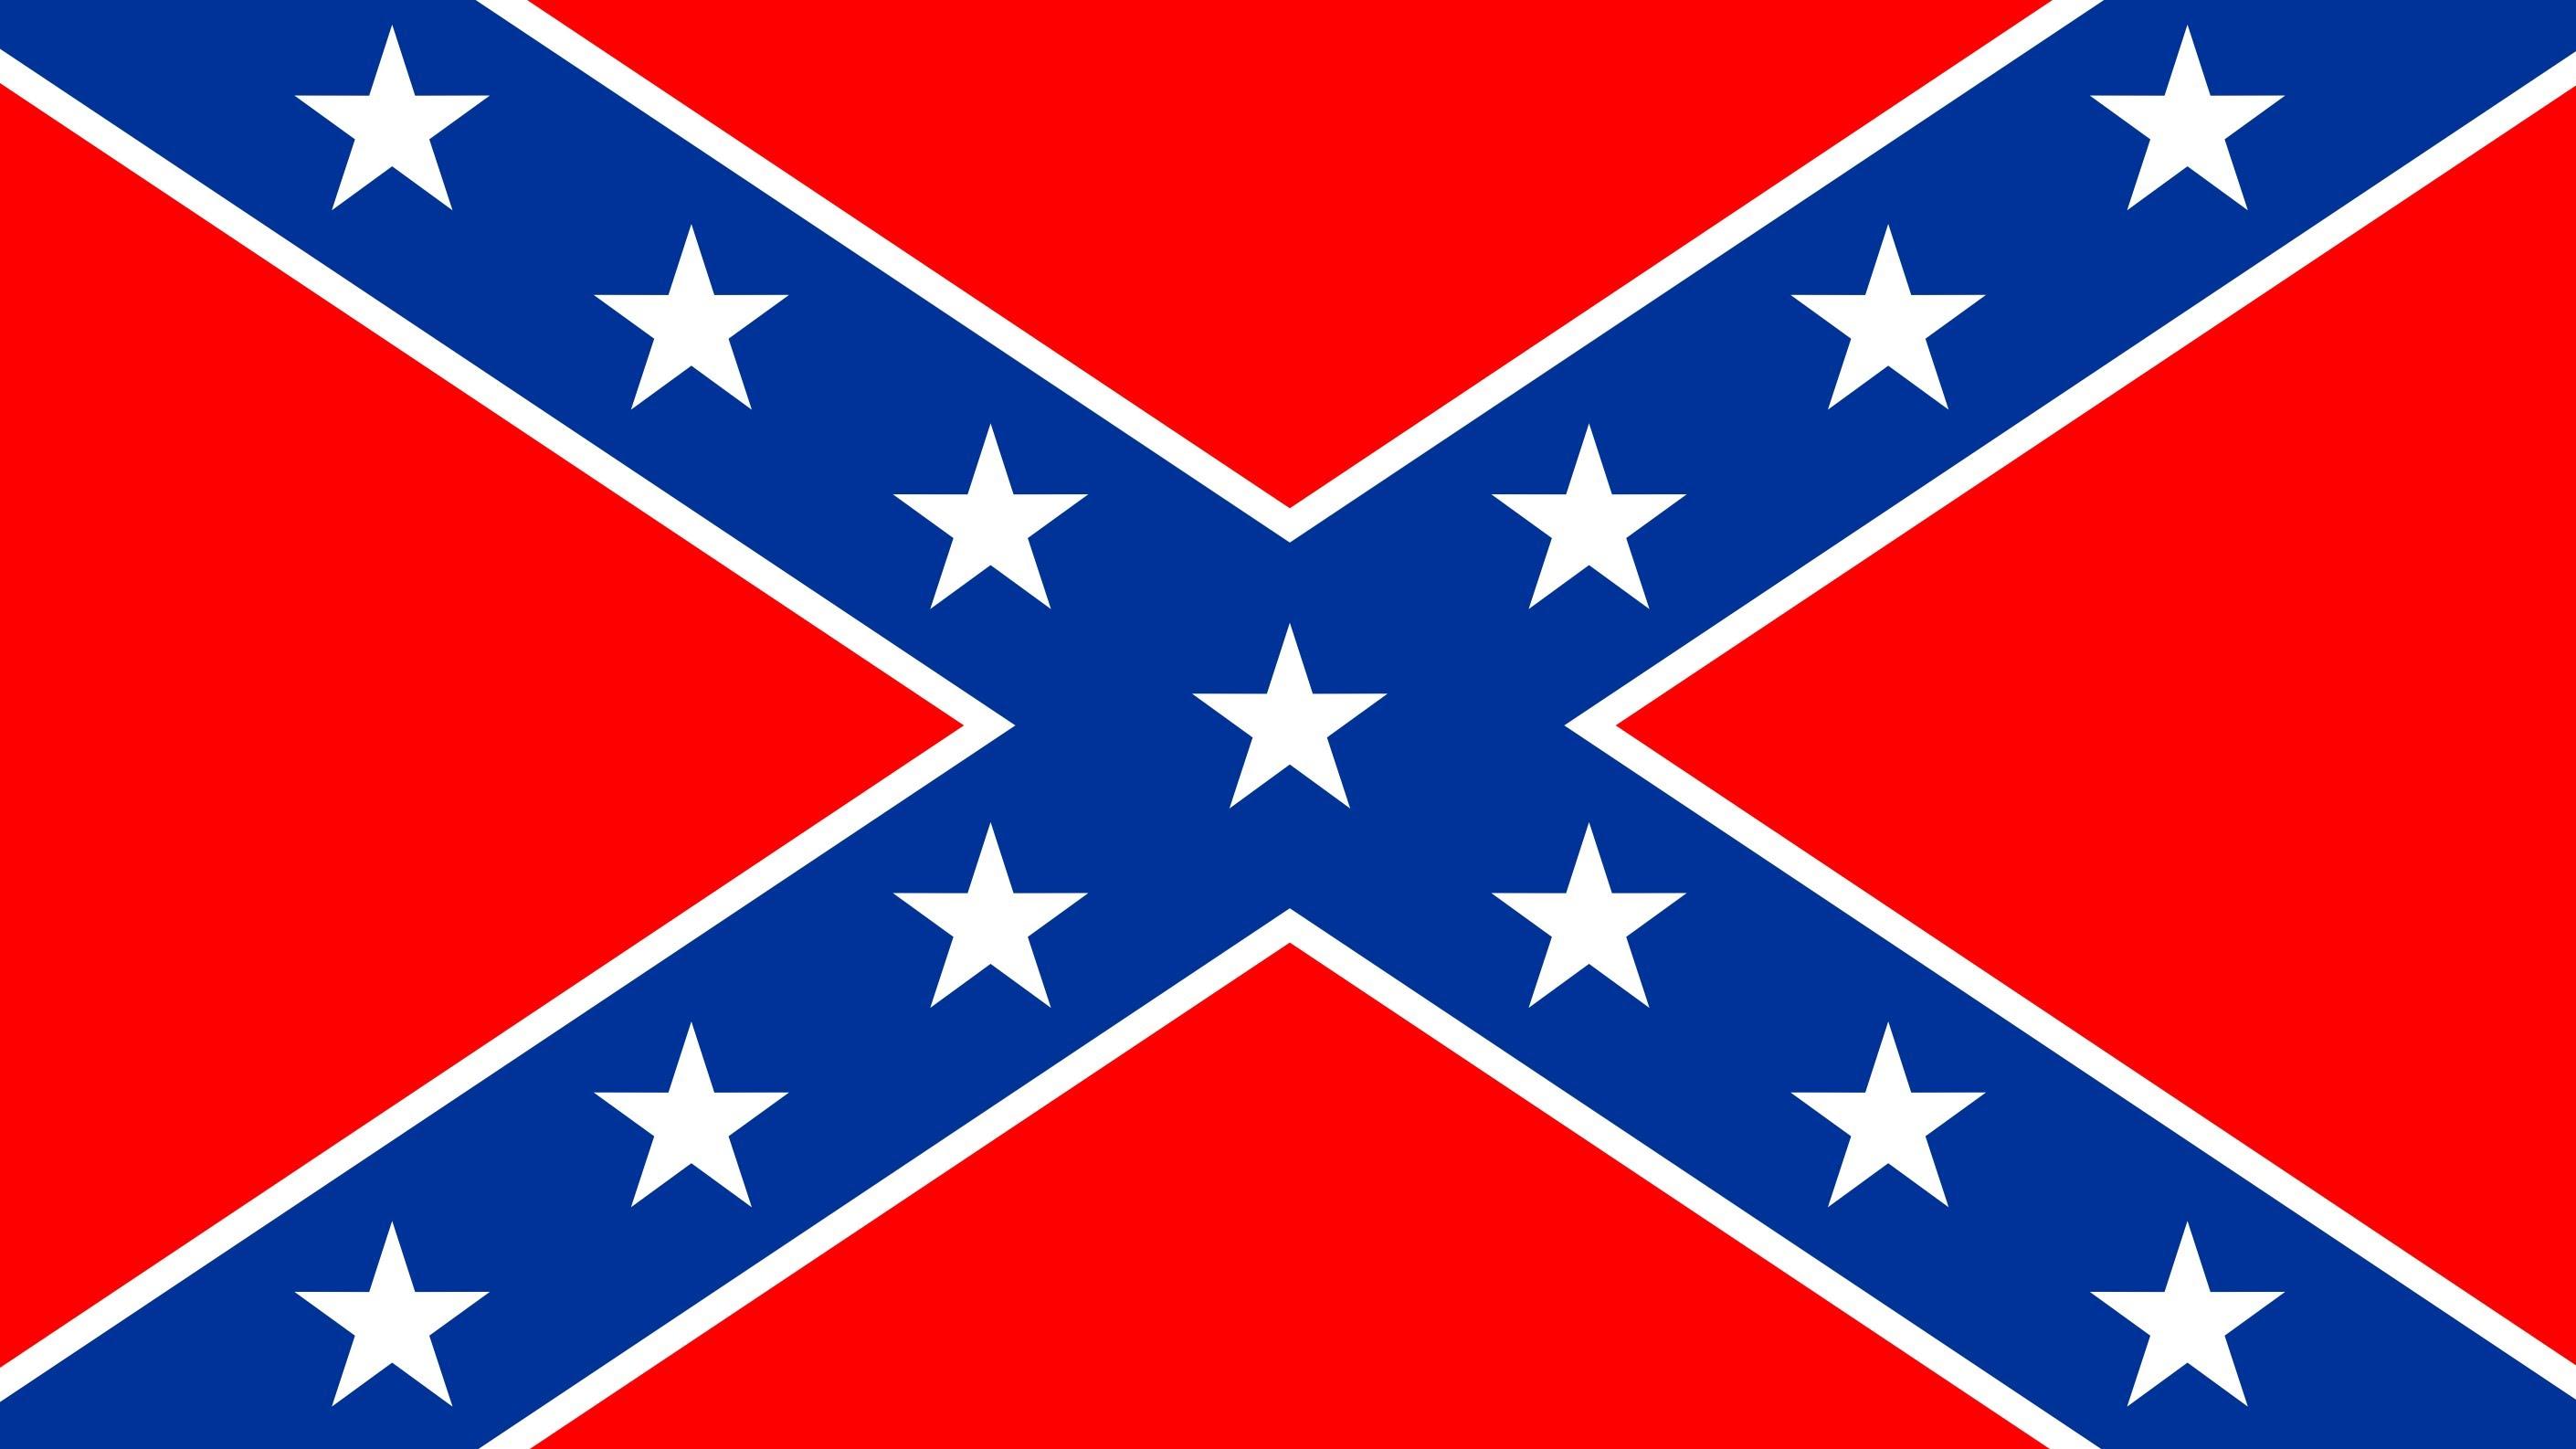 Confederate flag clipart clip art freeuse stock Free Rebel Flag, Download Free Clip Art, Free Clip Art on Clipart ... clip art freeuse stock